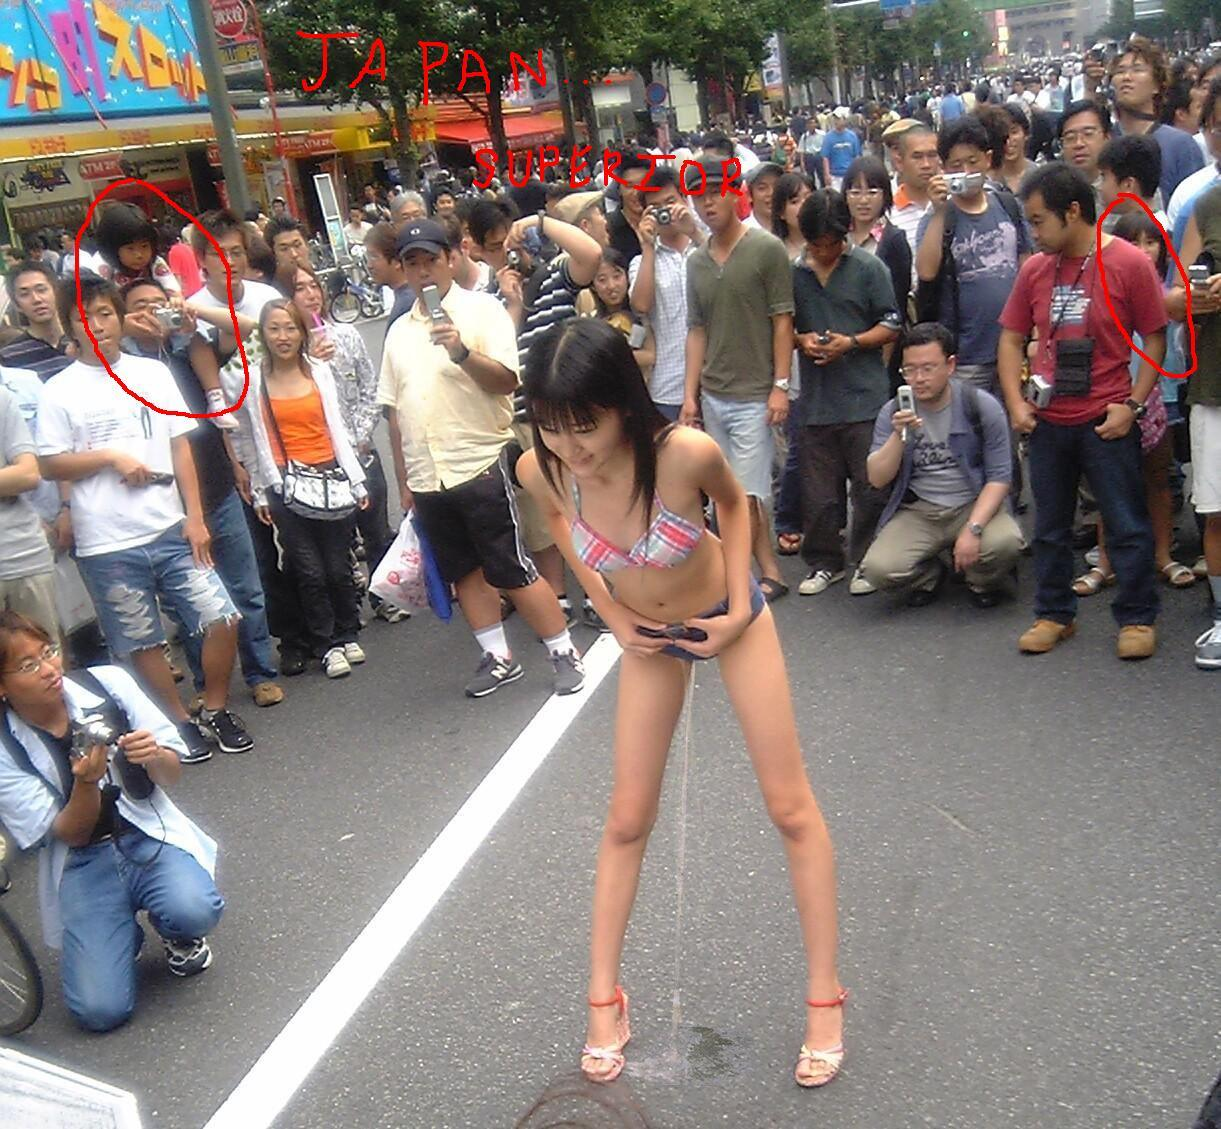 Japanese girls peeing standing up